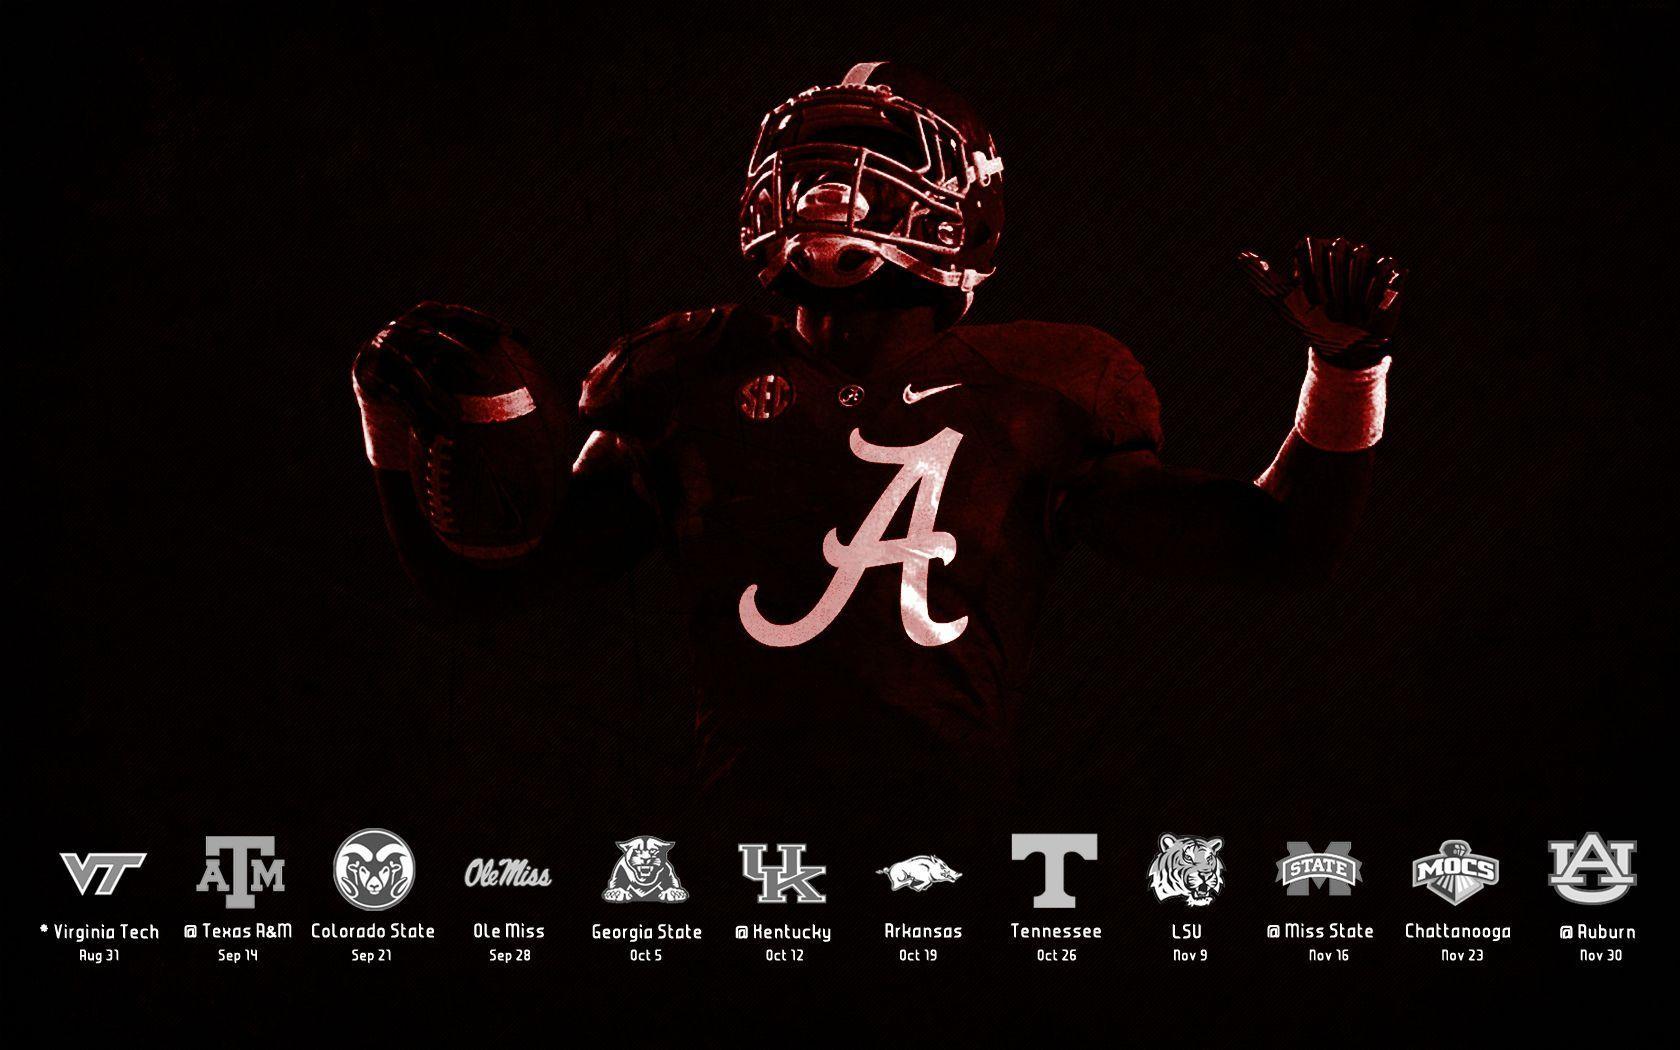 Alabama Football Wallpapers 2015 Wallpaper Cave All Dallas Cowboys